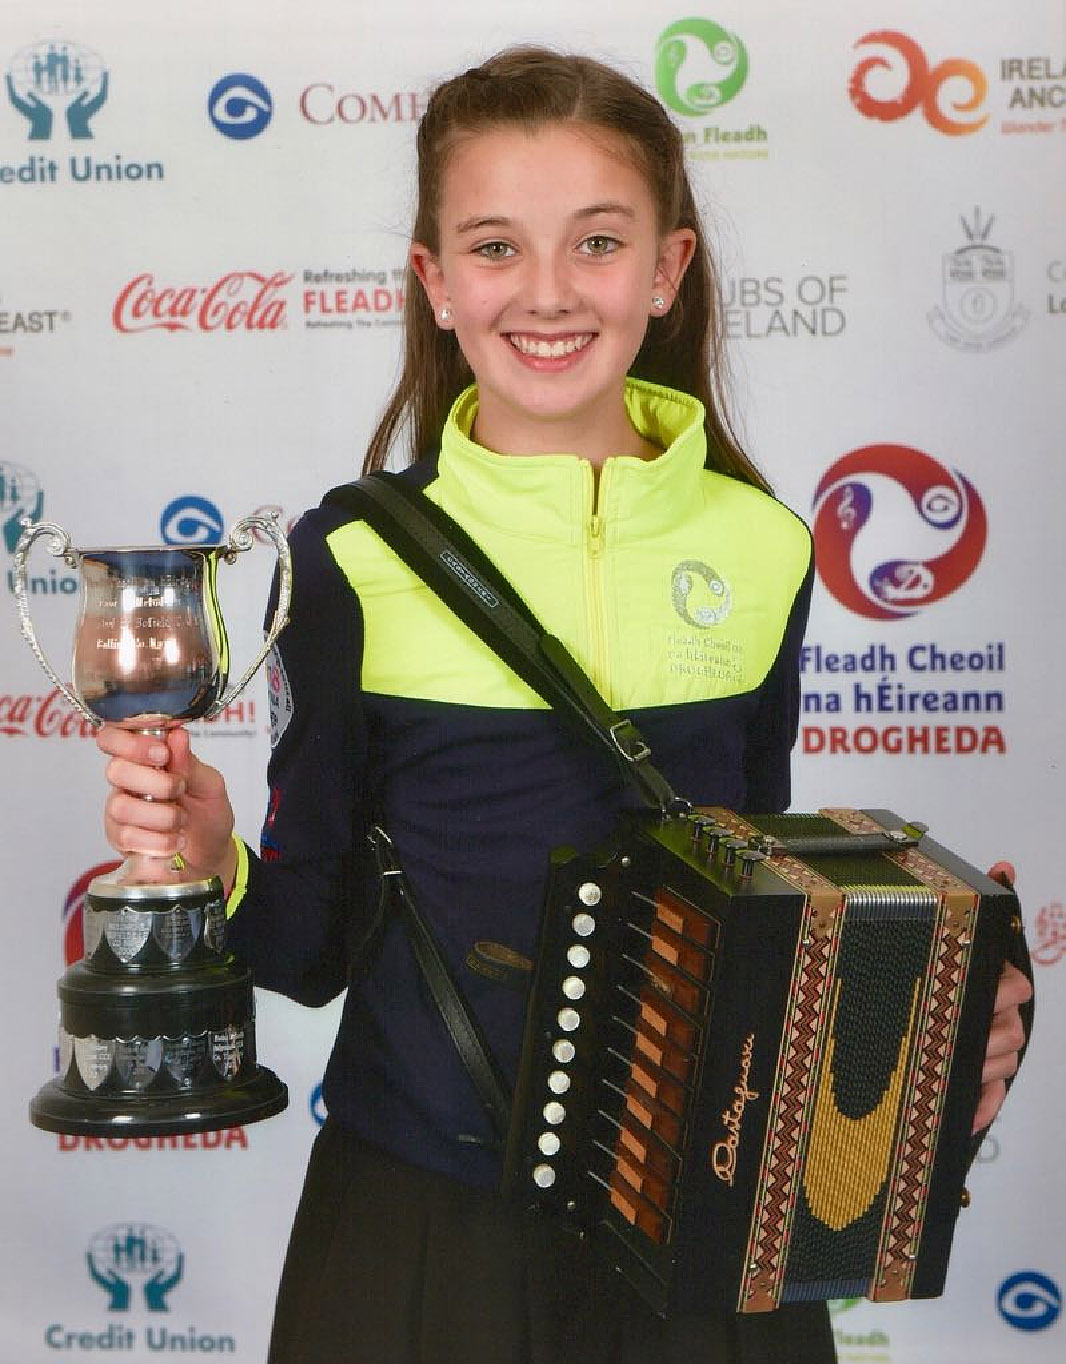 Anna McCaul C.C.É. Dún Dealgan winner of the Under 12 Melodeon  competition at Fleadh Cheoil na hÉireann in Drogheda